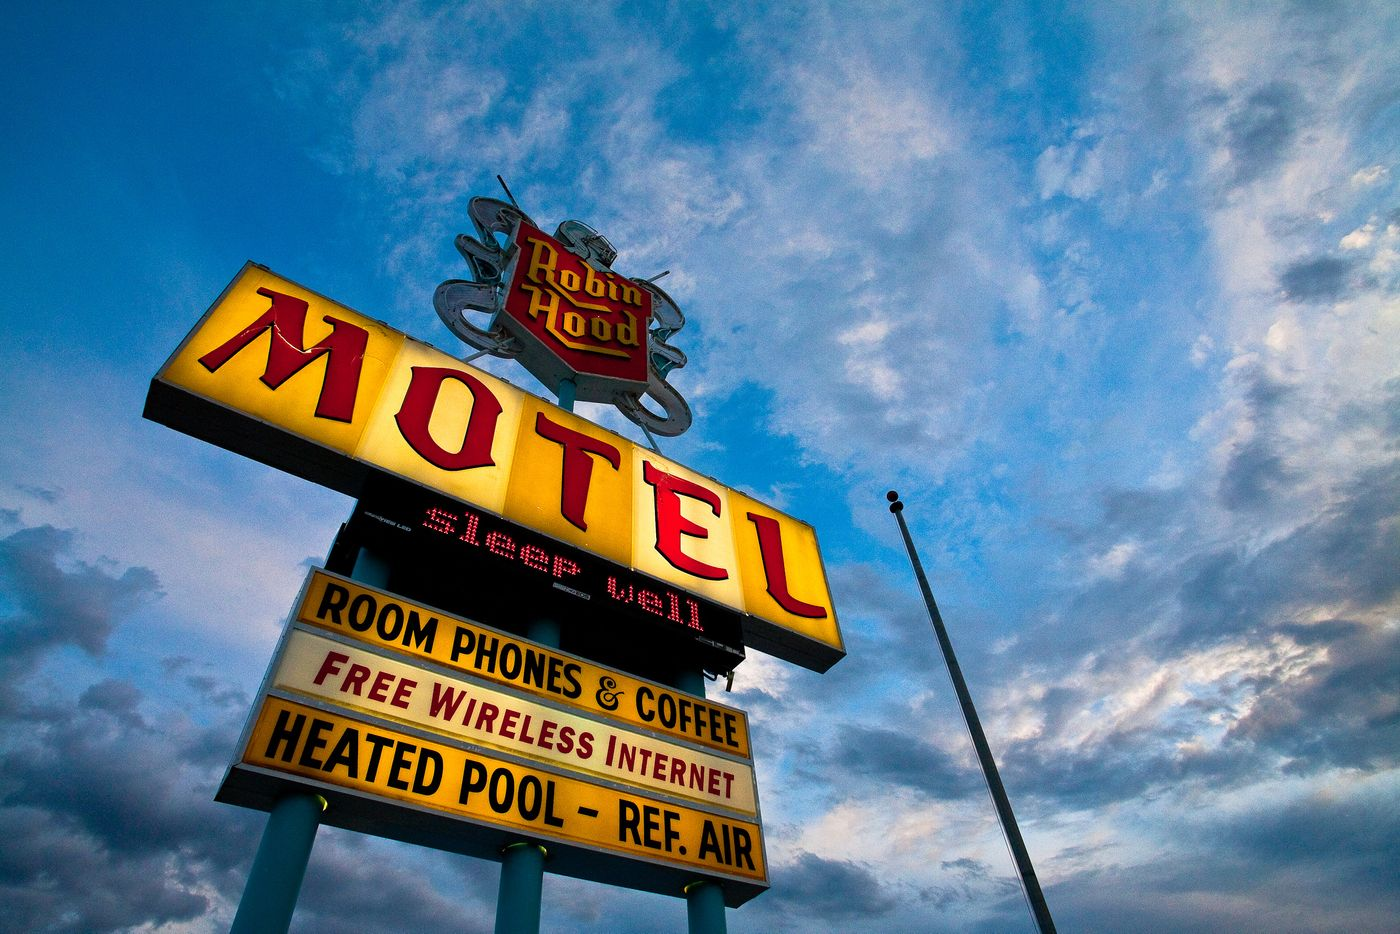 motel_2017_2018-15-WEB.jpg